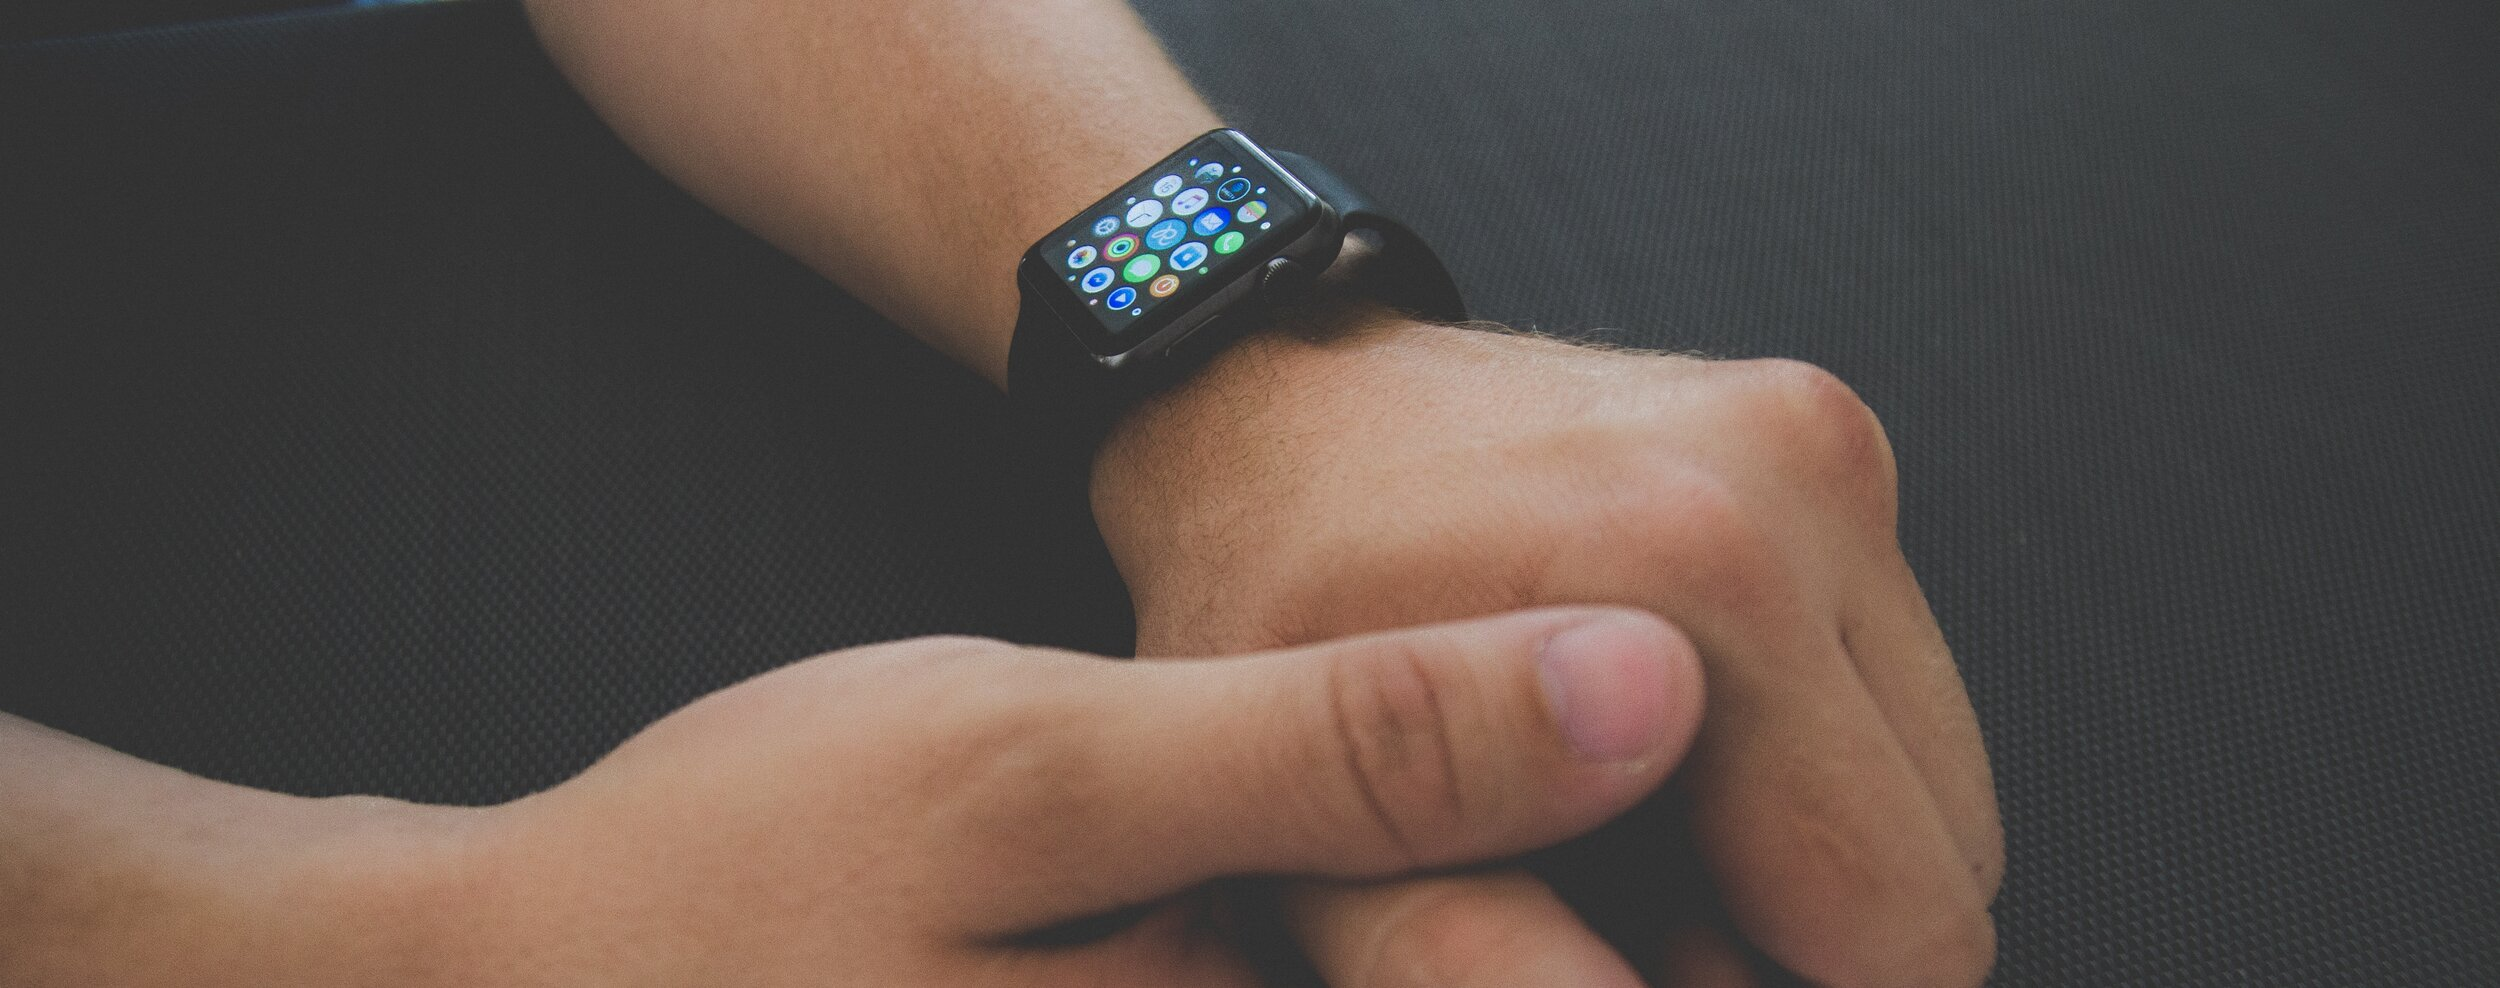 LIFX HomeKit Light Bulbs Work On Apple Watch